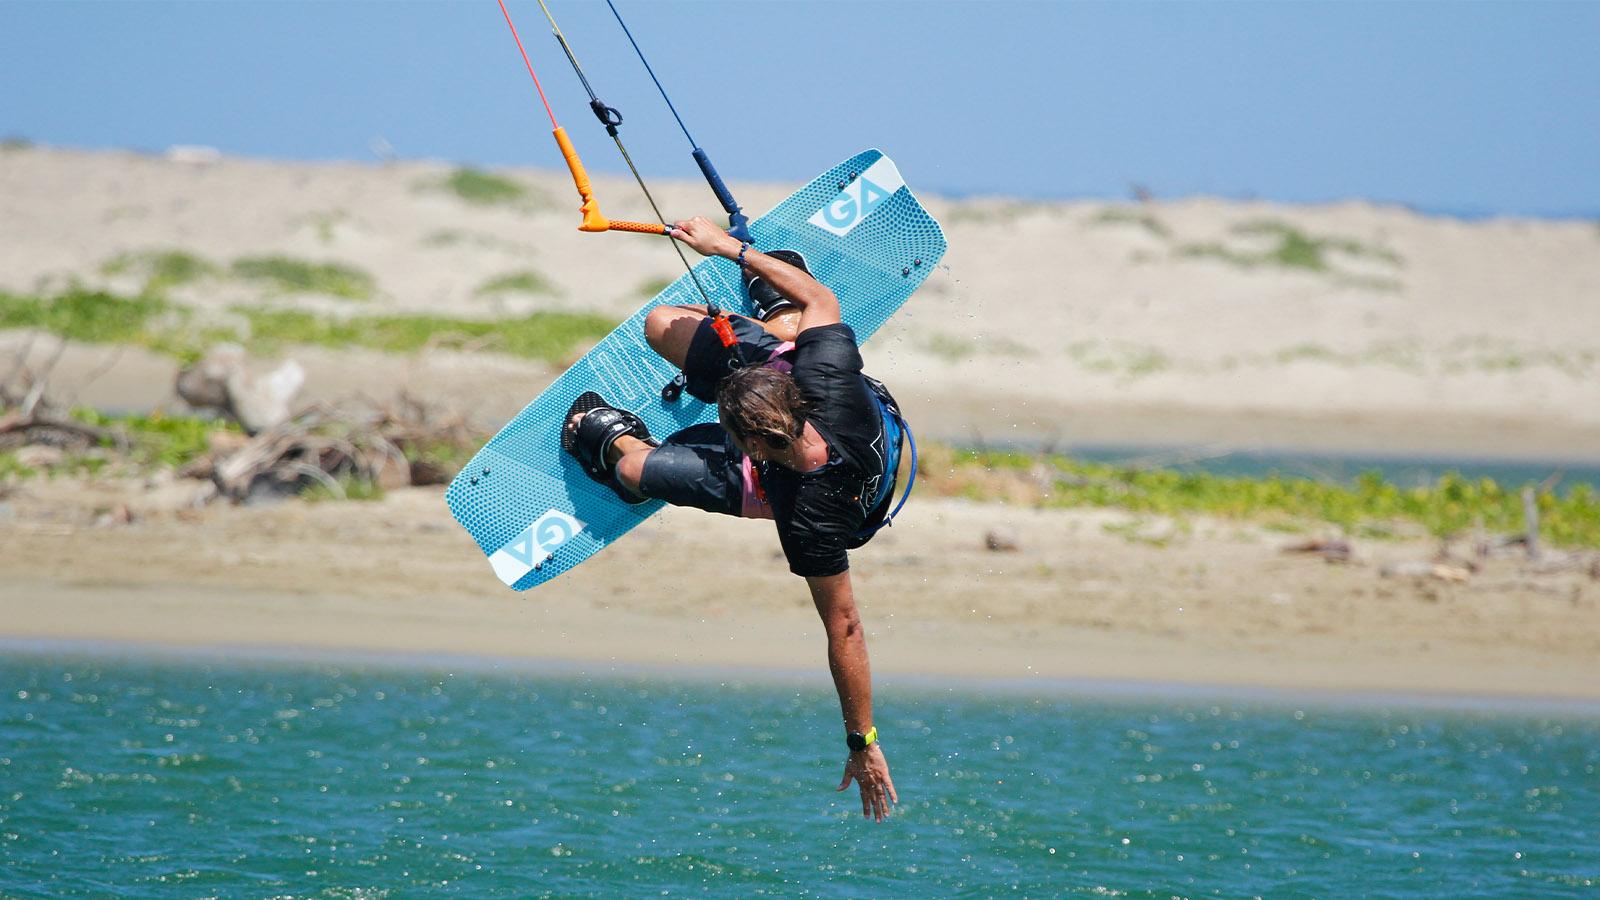 GA Kiteboarding 2020 Kiteboards